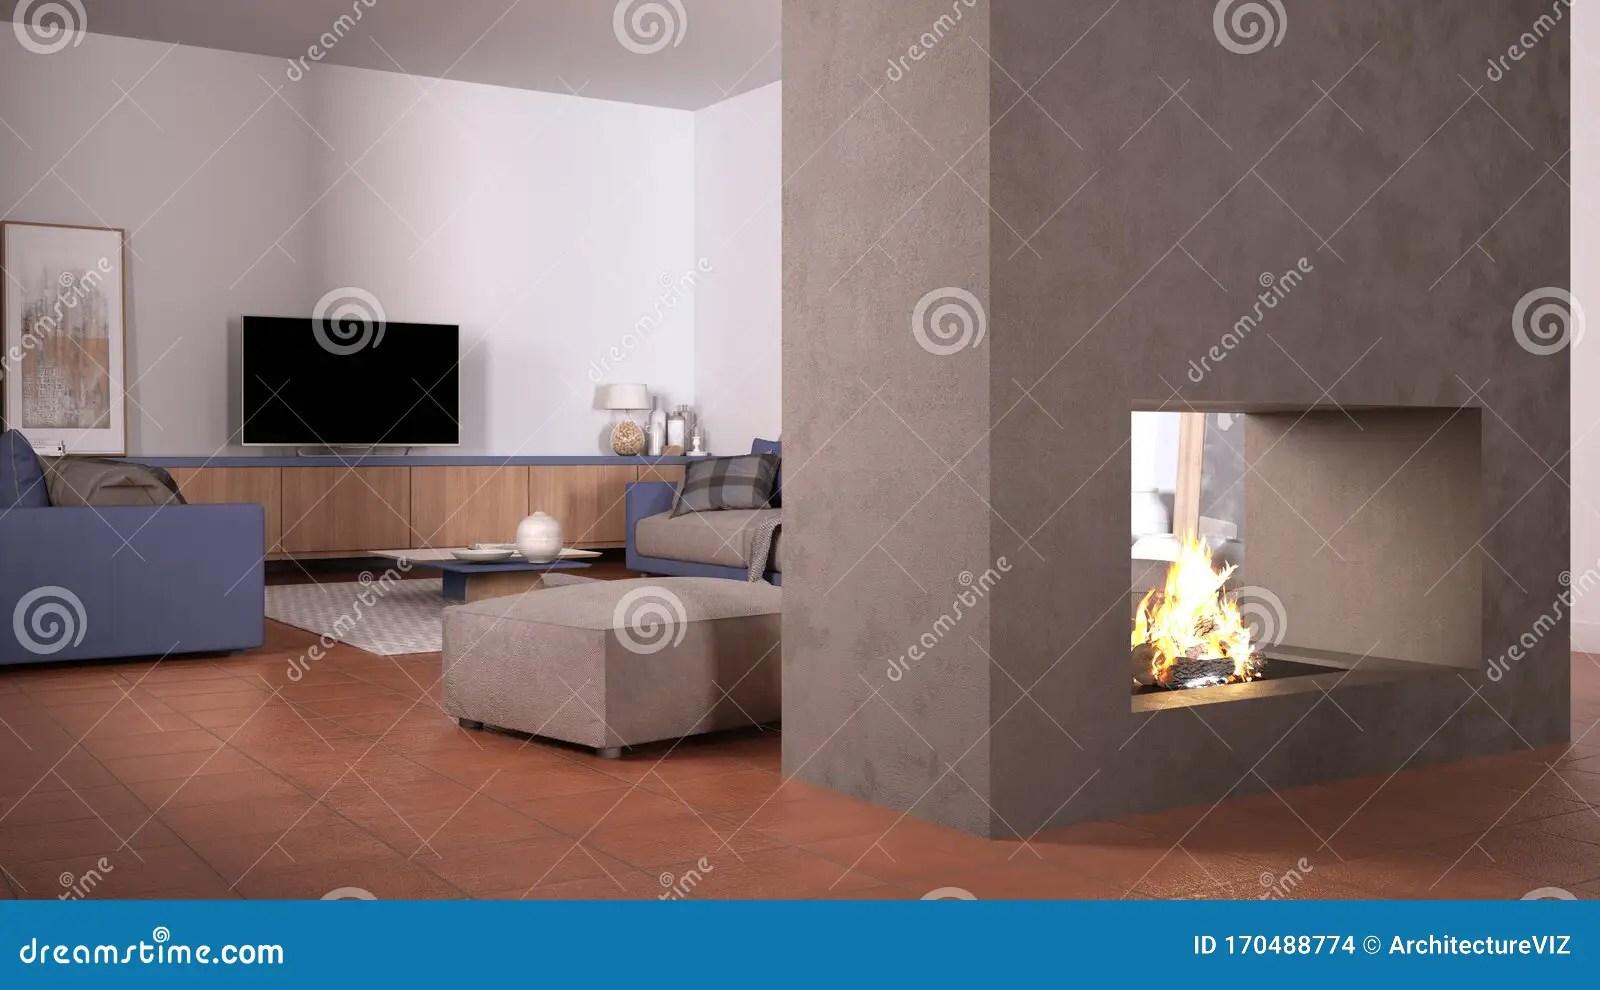 https www dreamstime com cosy purple beige living room sofa carpet table pouf concrete modern fireplace walls tv cabinet terracotta tile floors image170488774